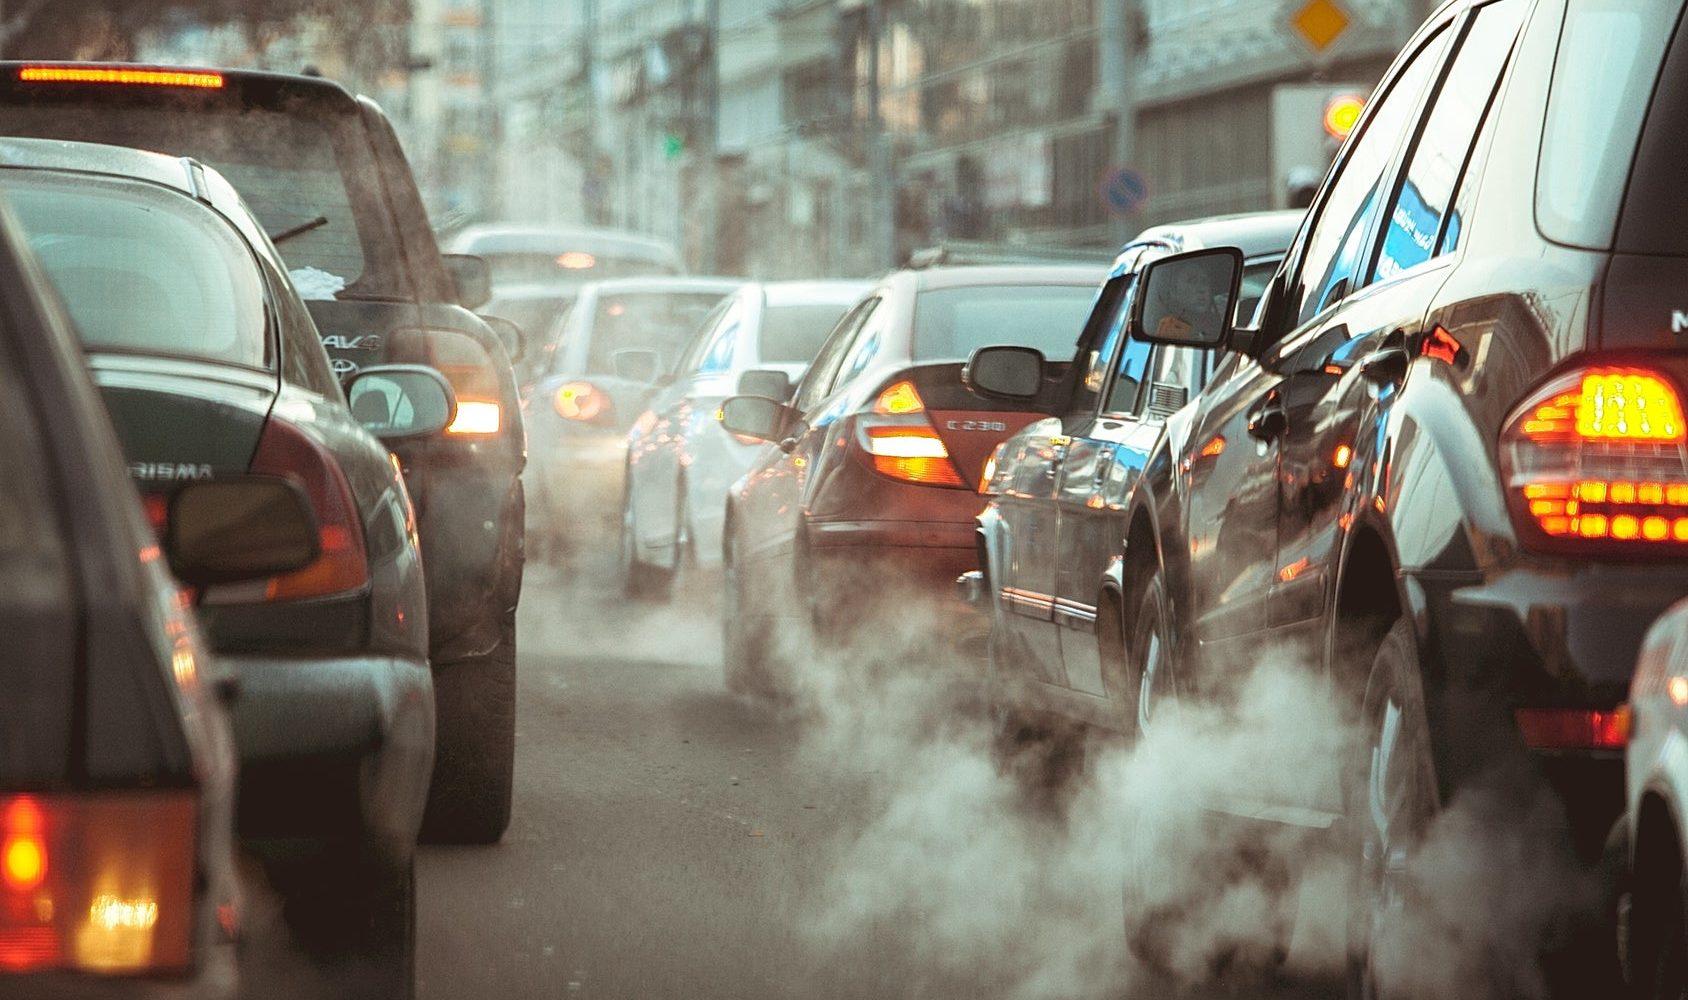 emissioni-veicoli-1688x1000.jpg